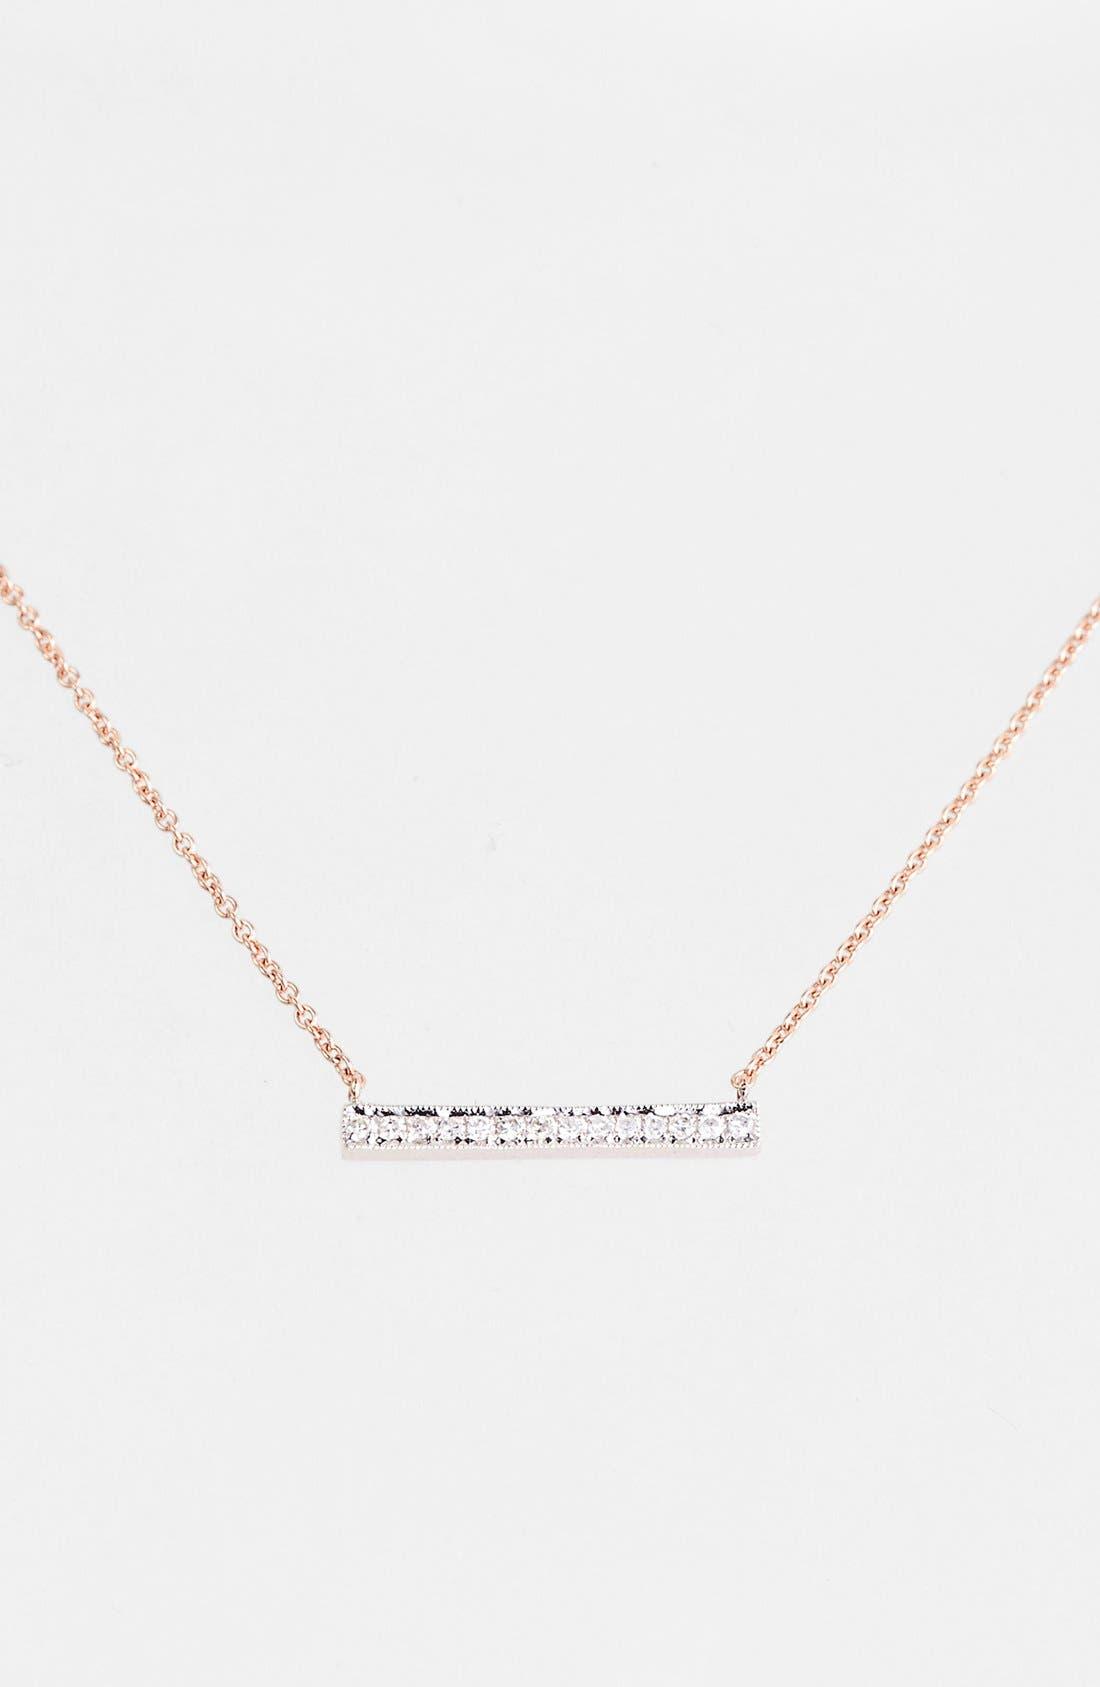 Alternate Image 1 Selected - Dana Rebecca Designs 'Sylvie Rose' Medium Diamond Bar Pendant Necklace